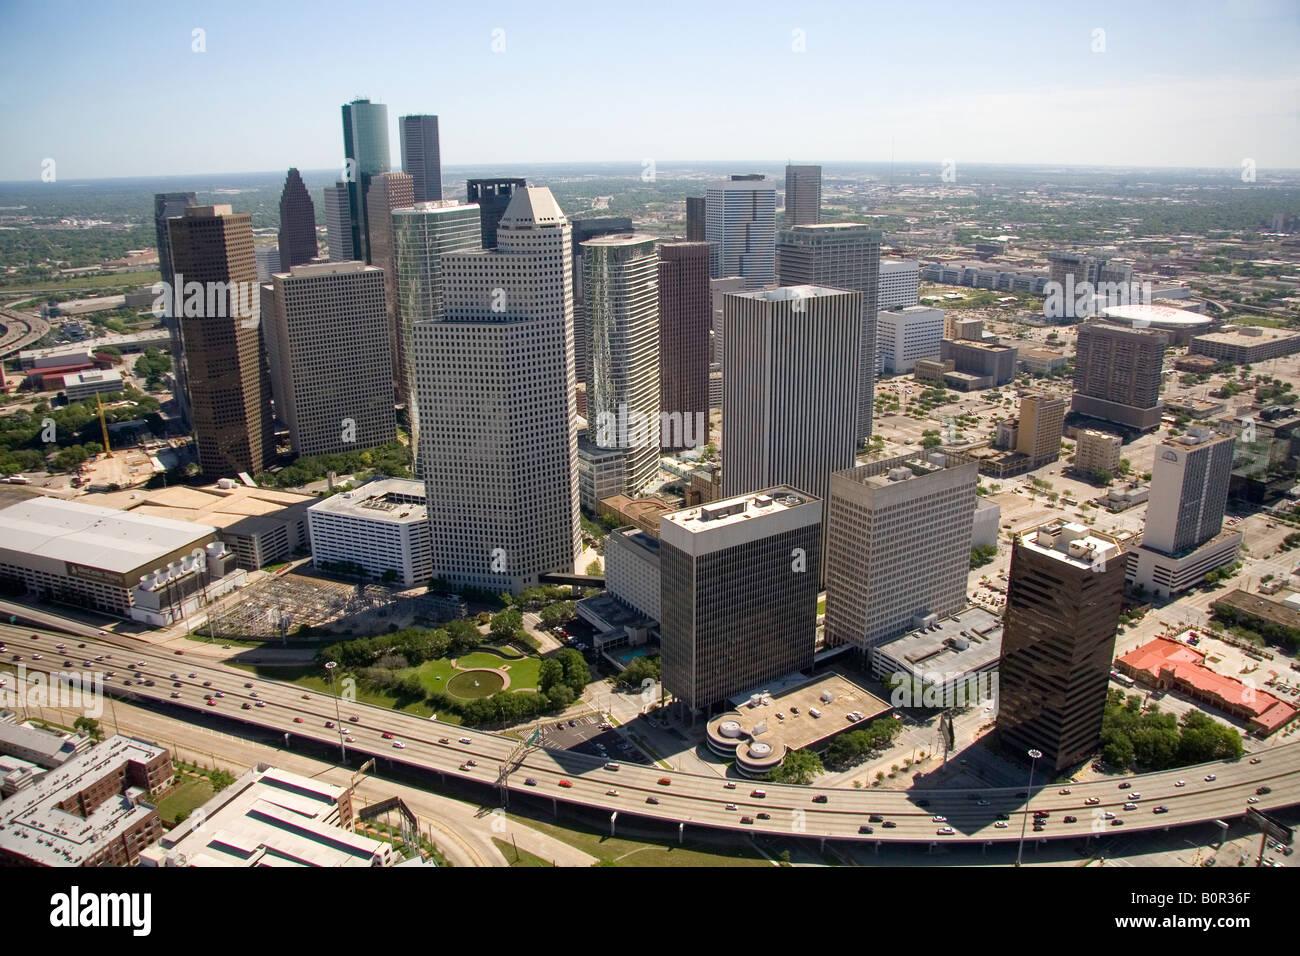 Aerial view of downtown Houston Texas - Stock Image